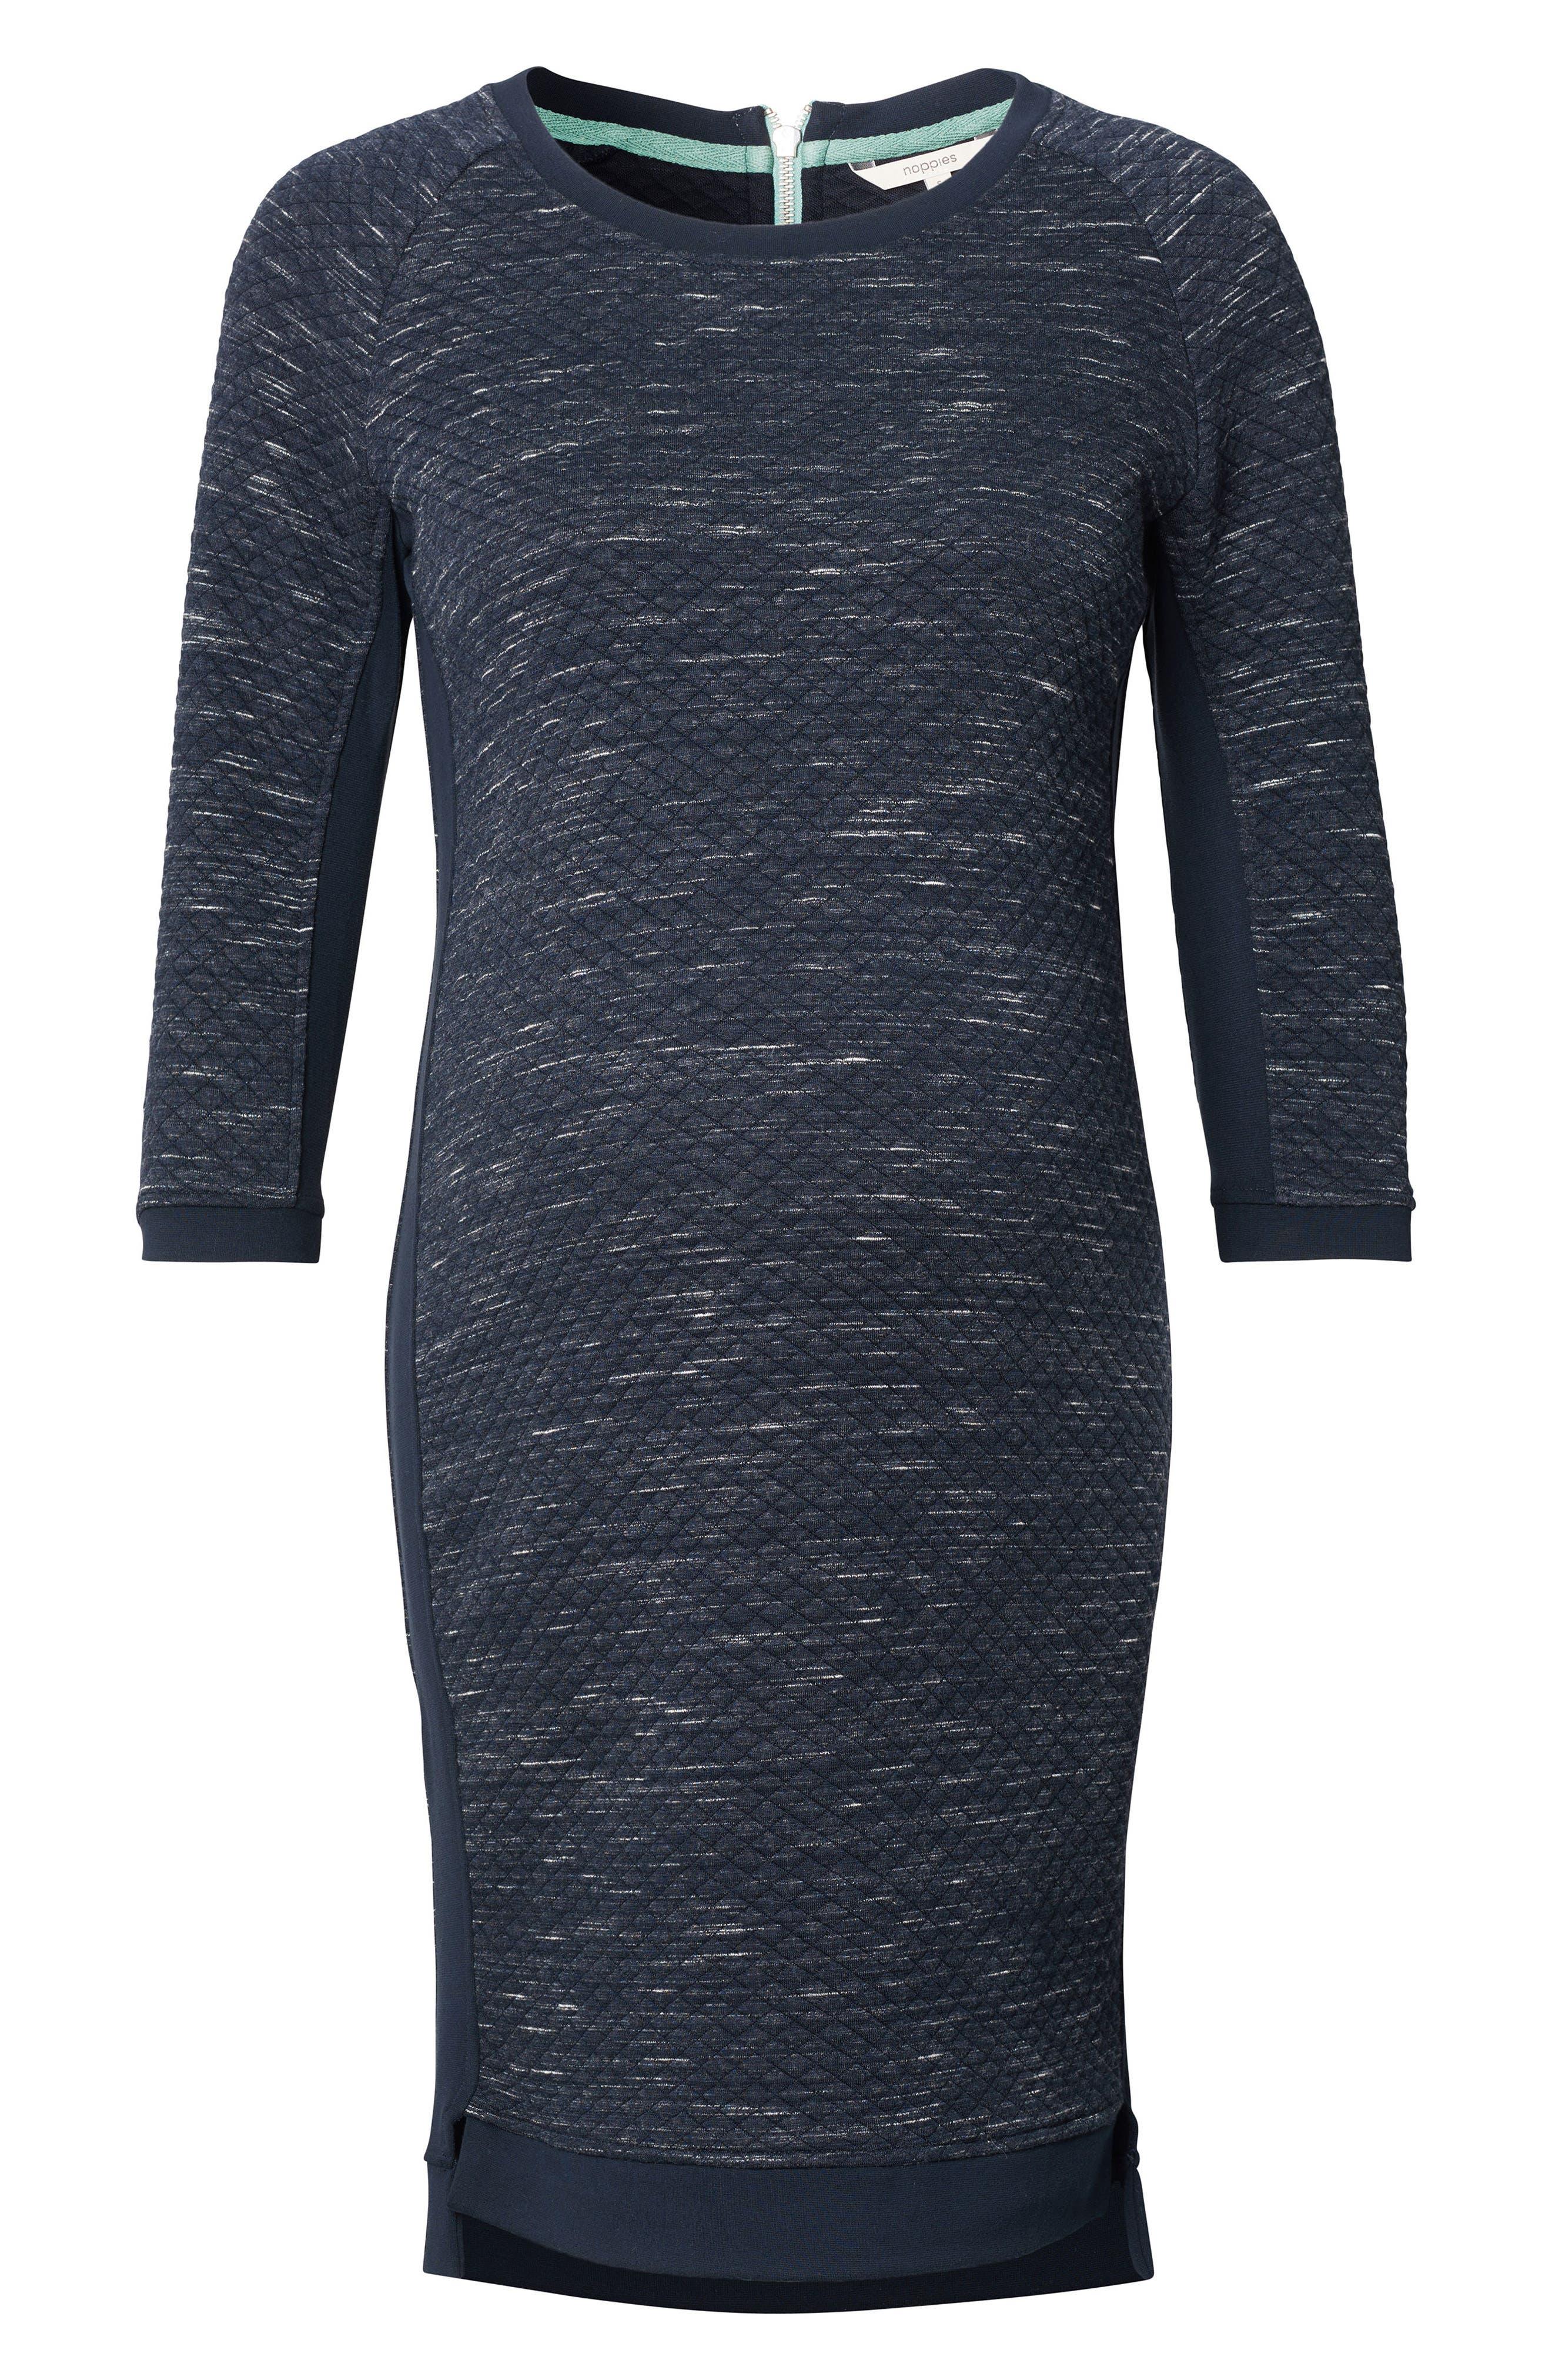 Main Image - Noppies Gemma Maternity Sweater Dress